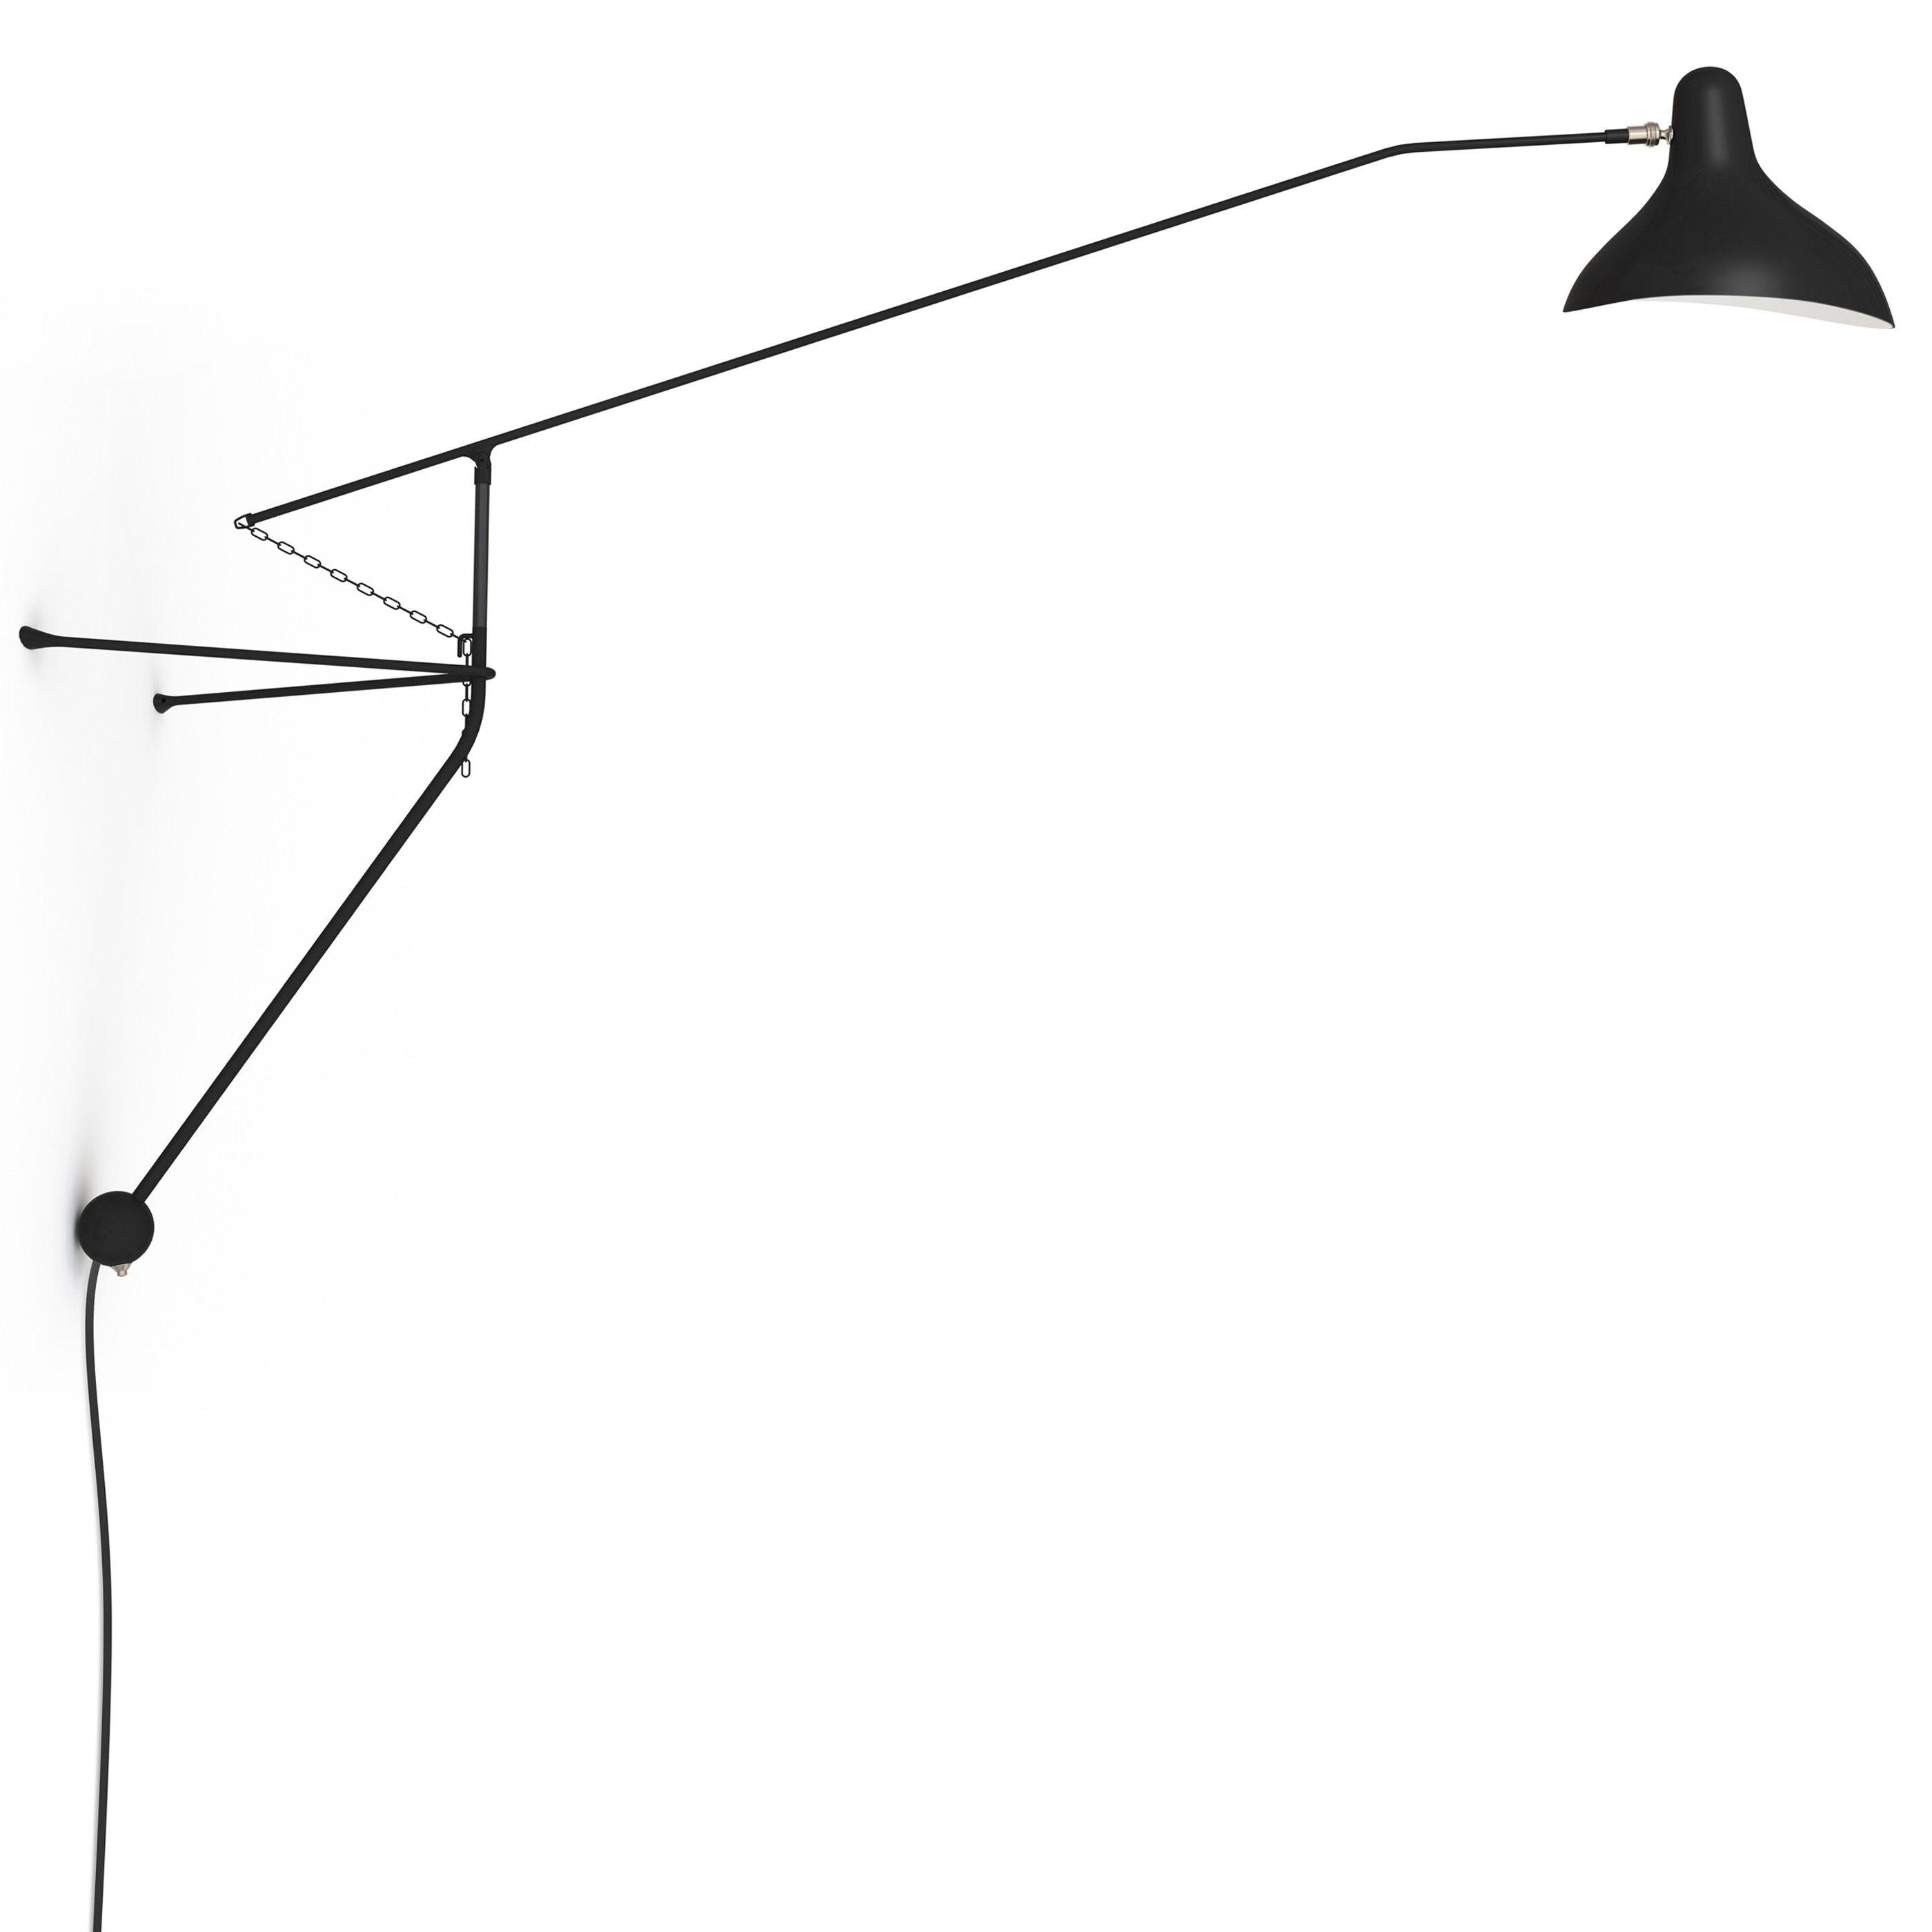 dcw ditions lampe mantis bs2 wandlamp flinders verzendt gratis. Black Bedroom Furniture Sets. Home Design Ideas